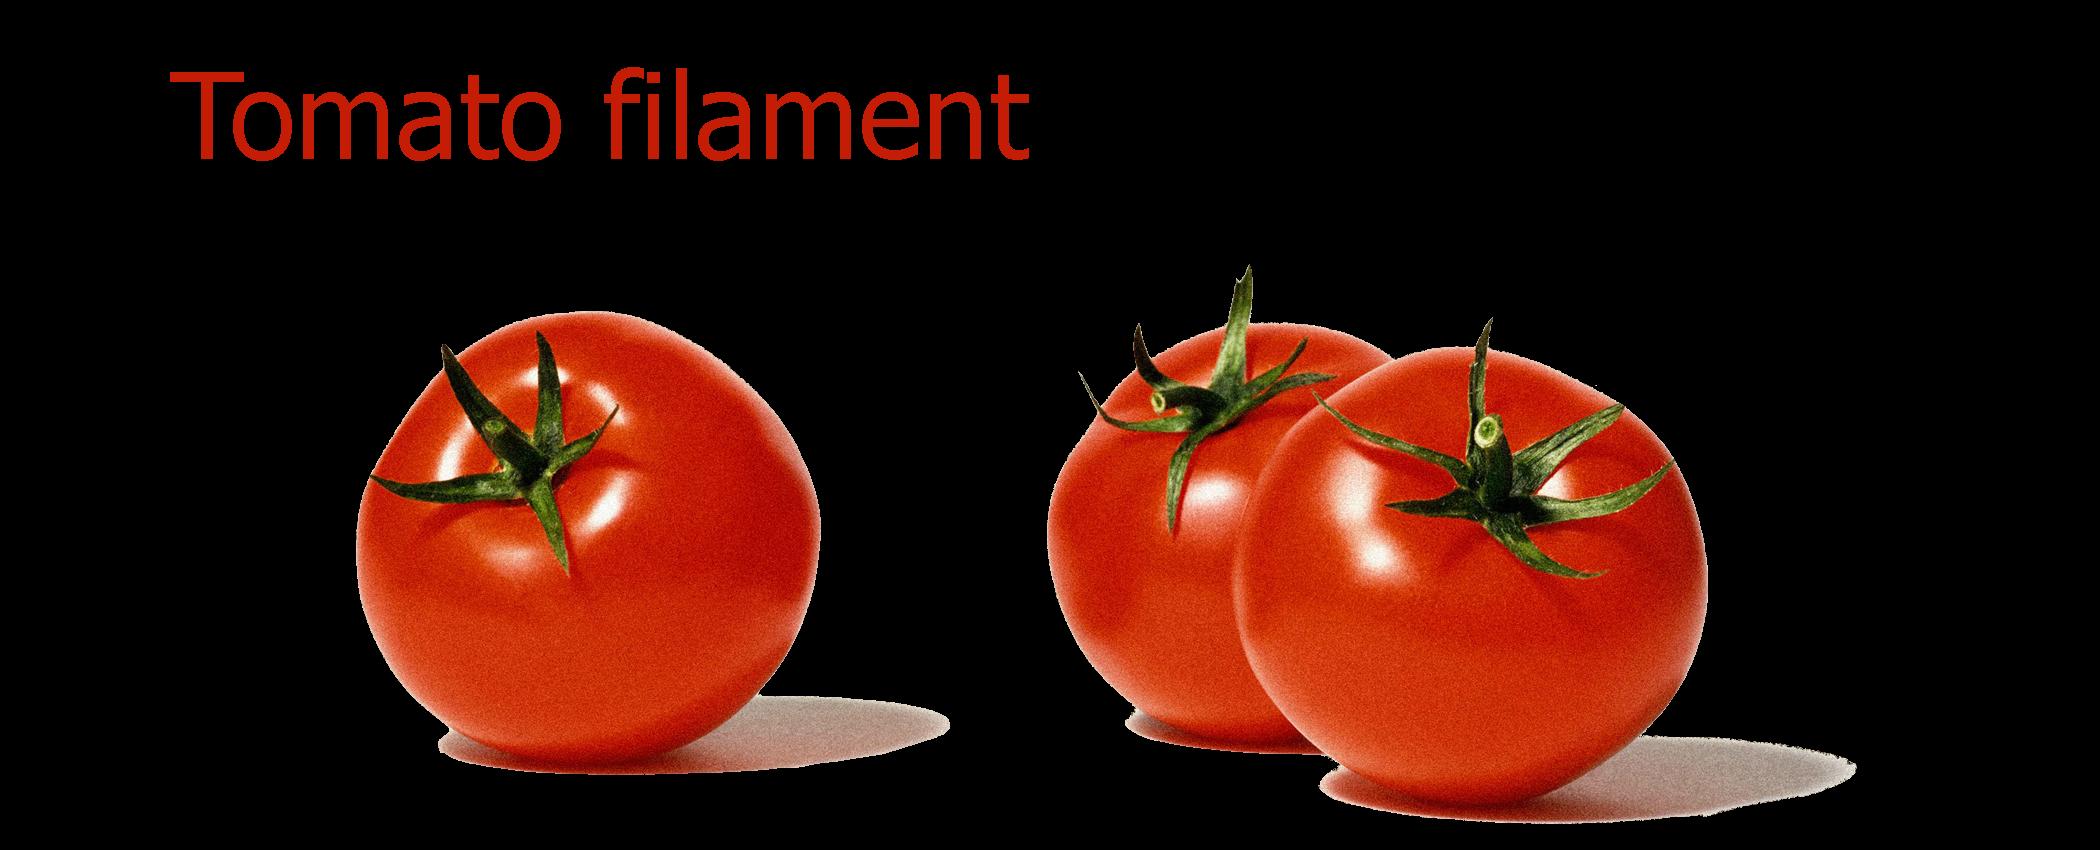 Tomatohemprinted